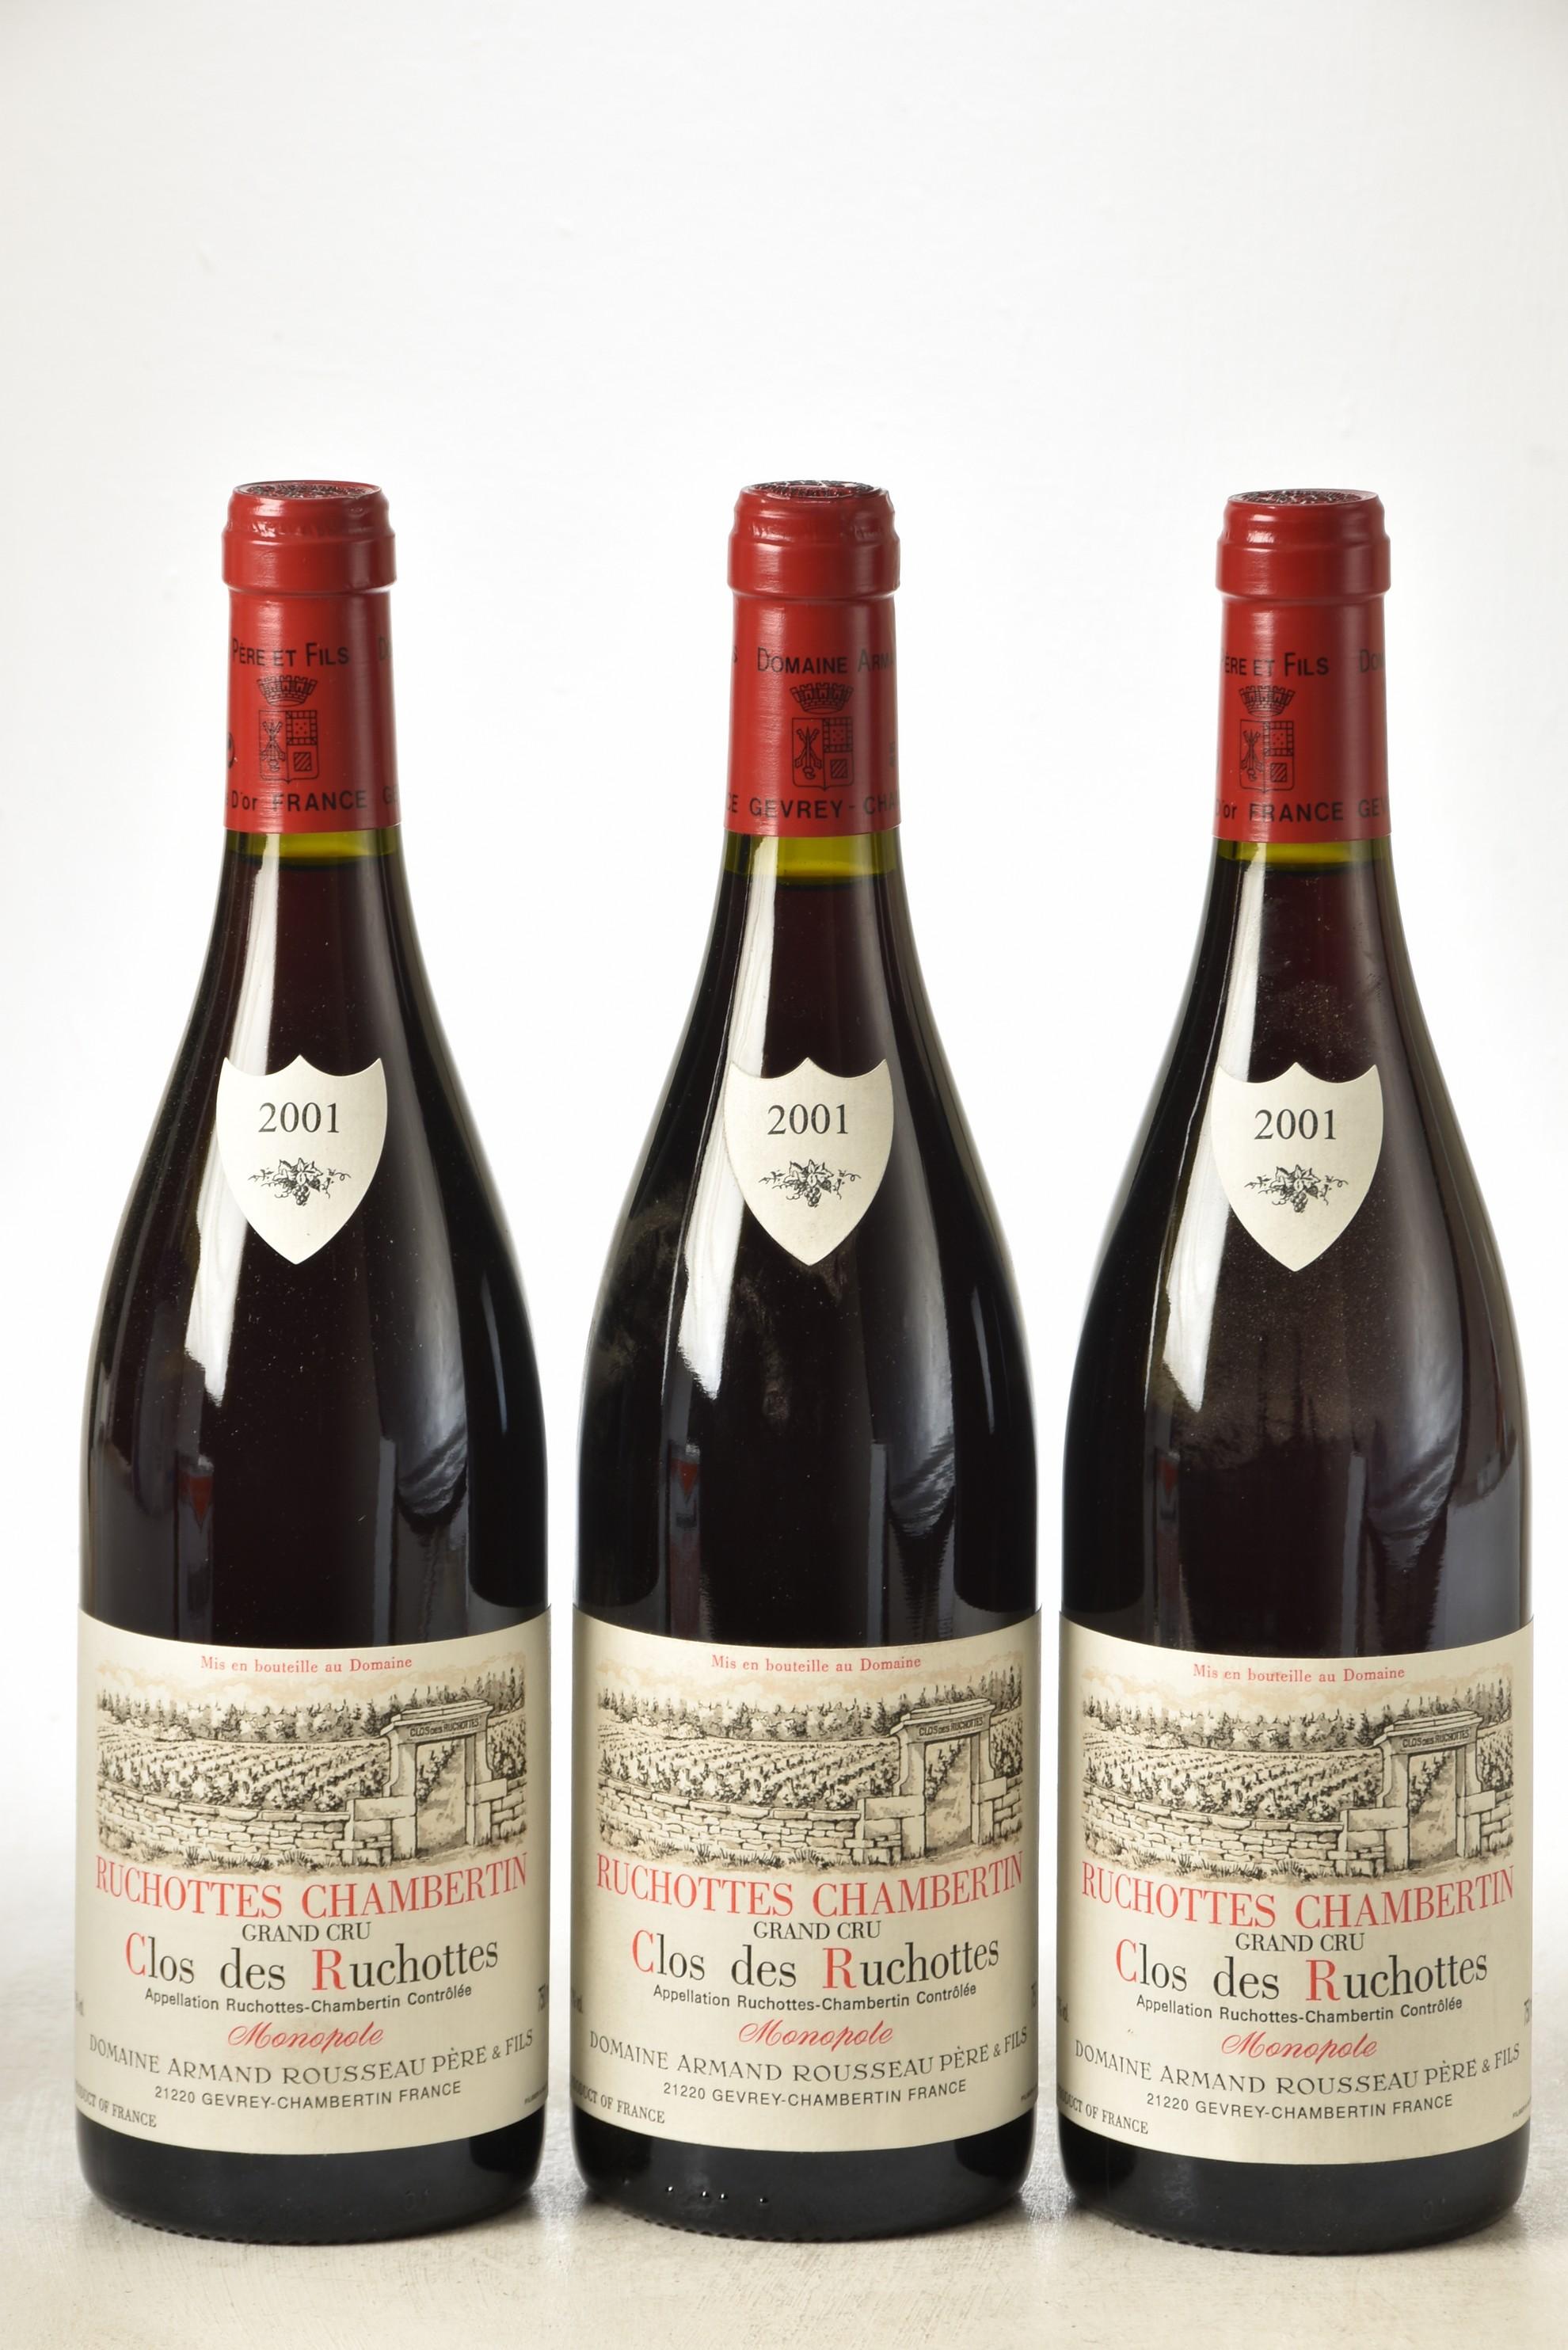 Ruchottes-Chambertin Clos des Ruchottes 2001 Domaine Armand Rousseau 3 bts IN BOND